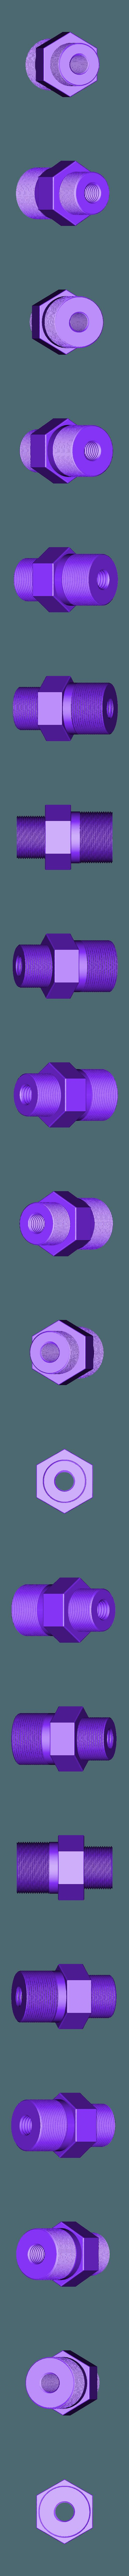 pièce 1 - arrache volant.stl Download free STL file Flying rake • 3D printable design, Simonchantcliquet